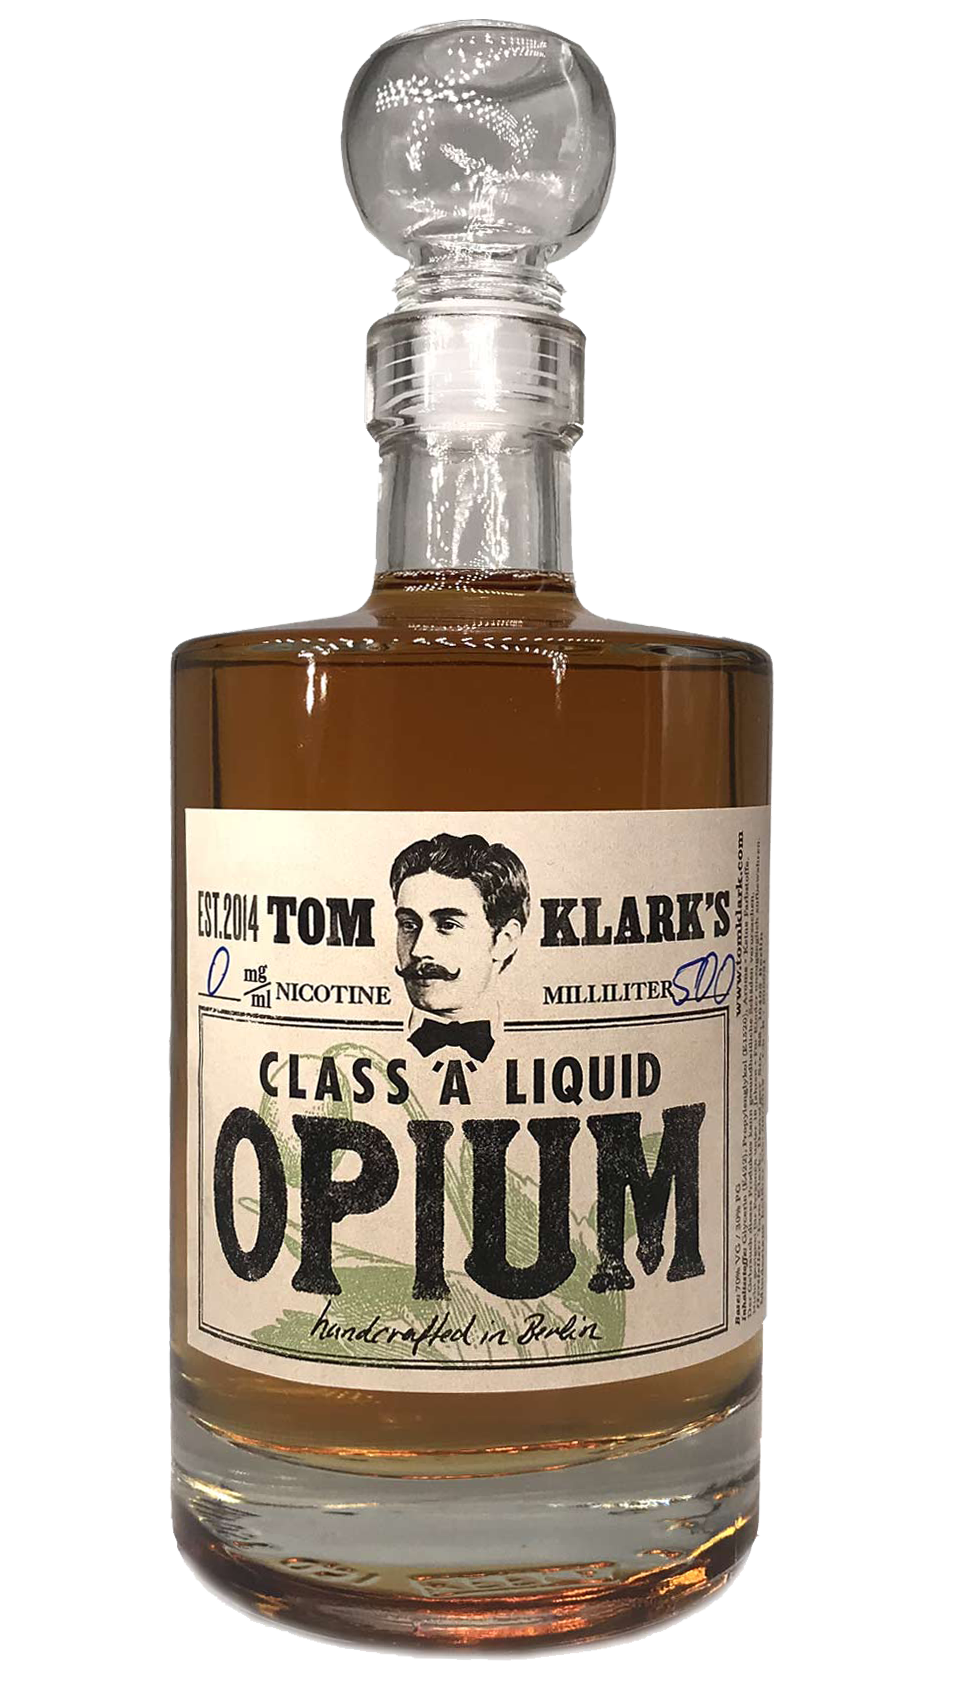 TOM KLARK Glasflasche Opium 500ml Kapazität (Leerflasche)